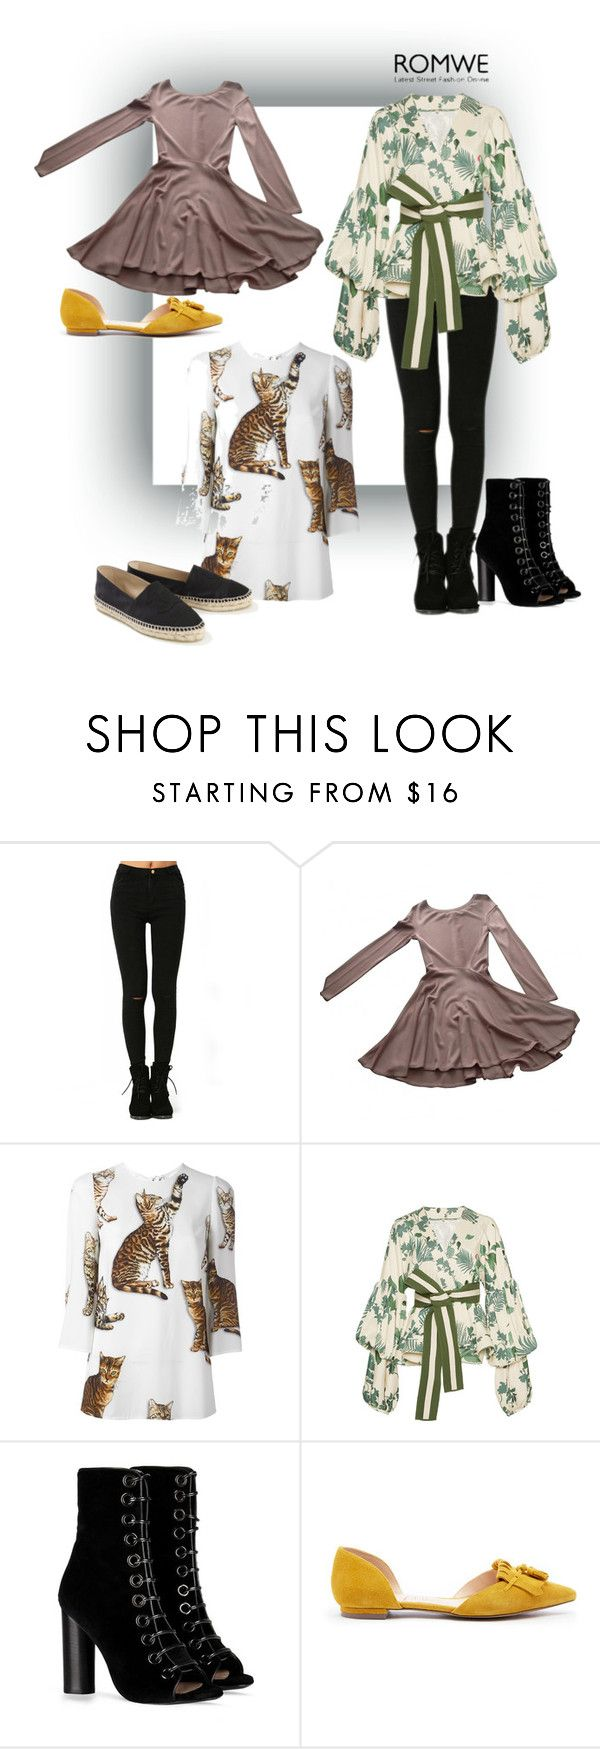 """Romwe.com contest! - Win these black skinny ripped denim pants!"" by juemaciel on Polyvore featuring moda, Alaïa, Dolce&Gabbana, Johanna Ortiz, Barbara Bui, Sole Society e Chanel"